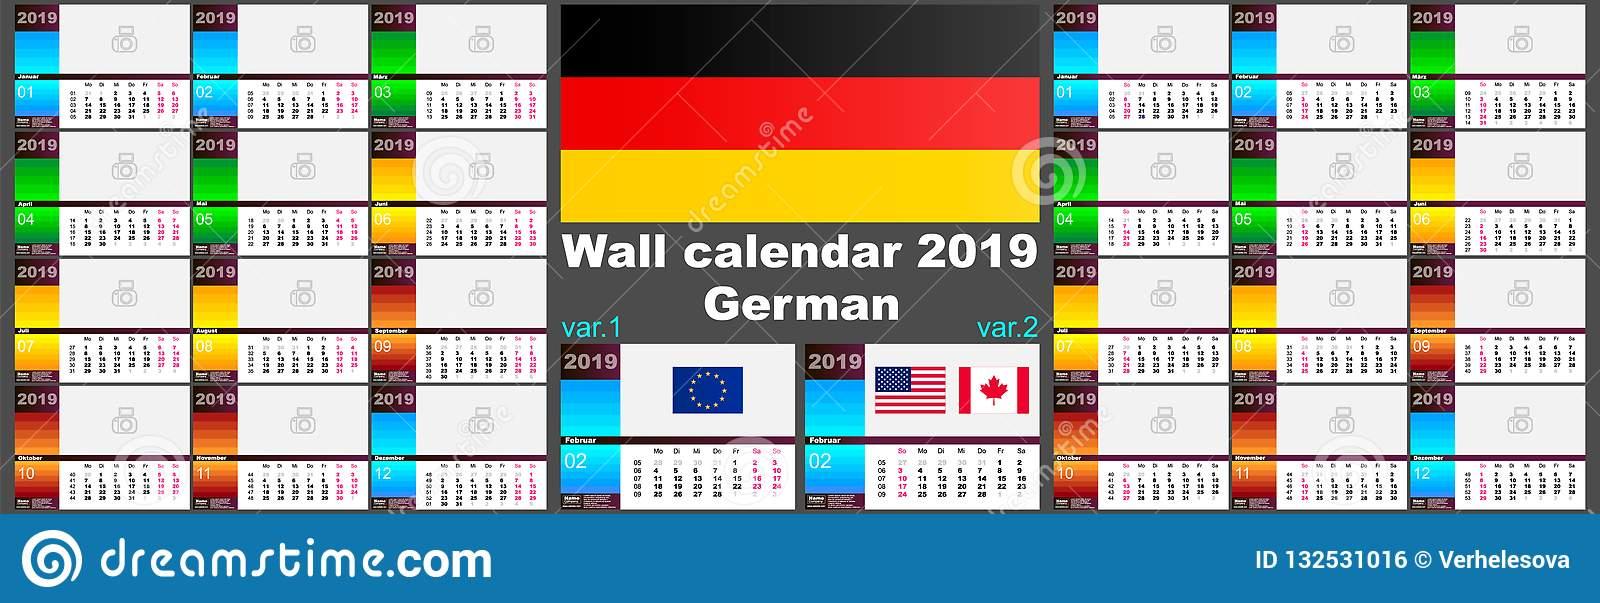 2019 Deutsche German Wall Calendar. Two Iso 8601 Templates